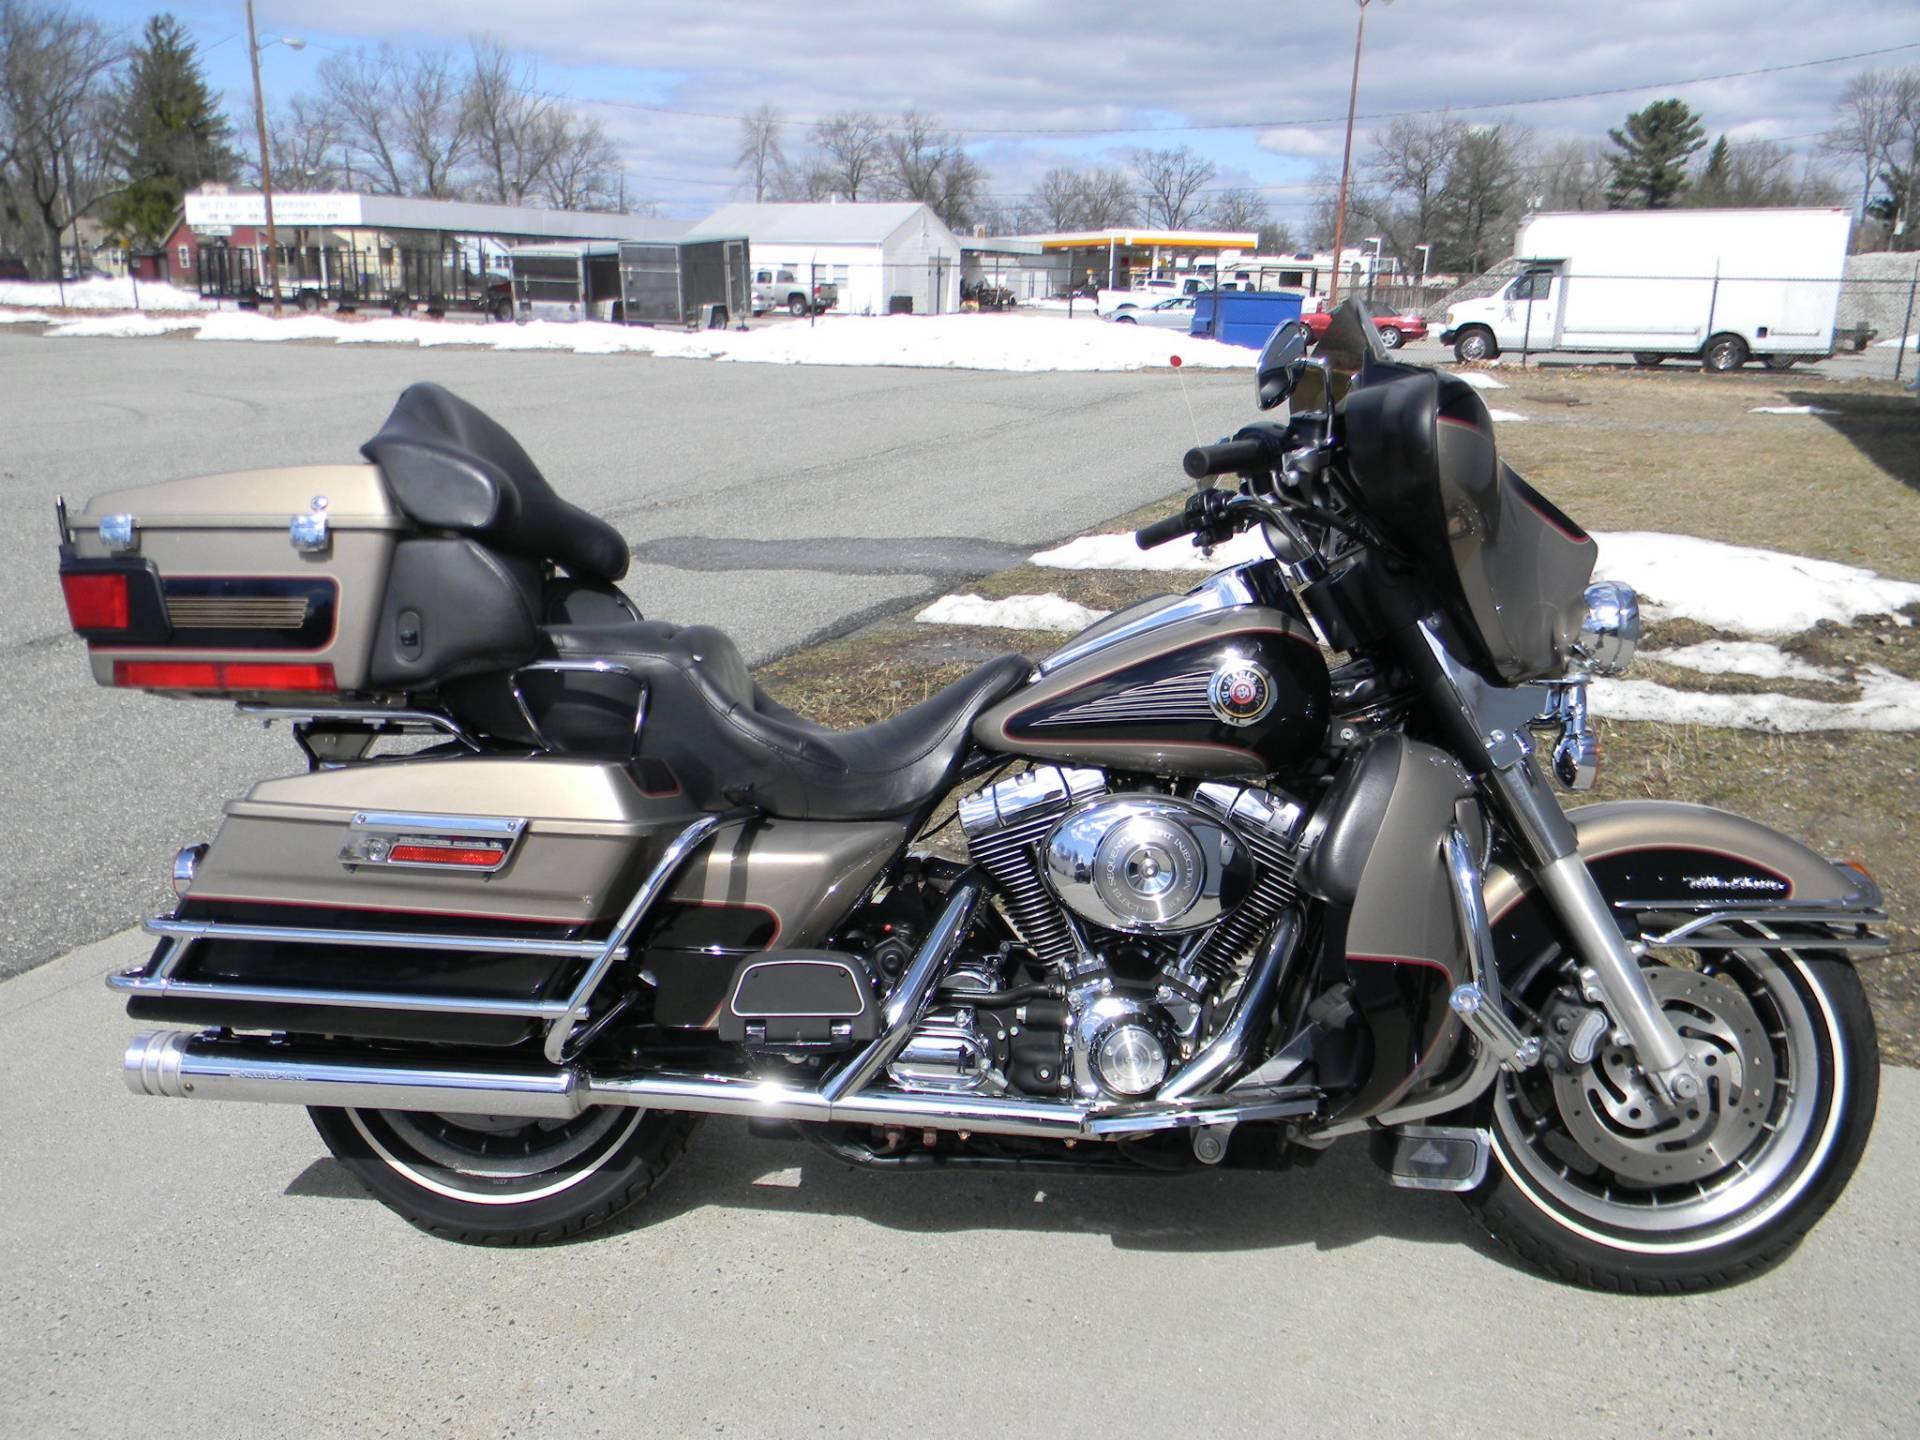 2004 Harley-Davidson FLHTC/FLHTCI Electra Glide® Classic in Springfield, Massachusetts